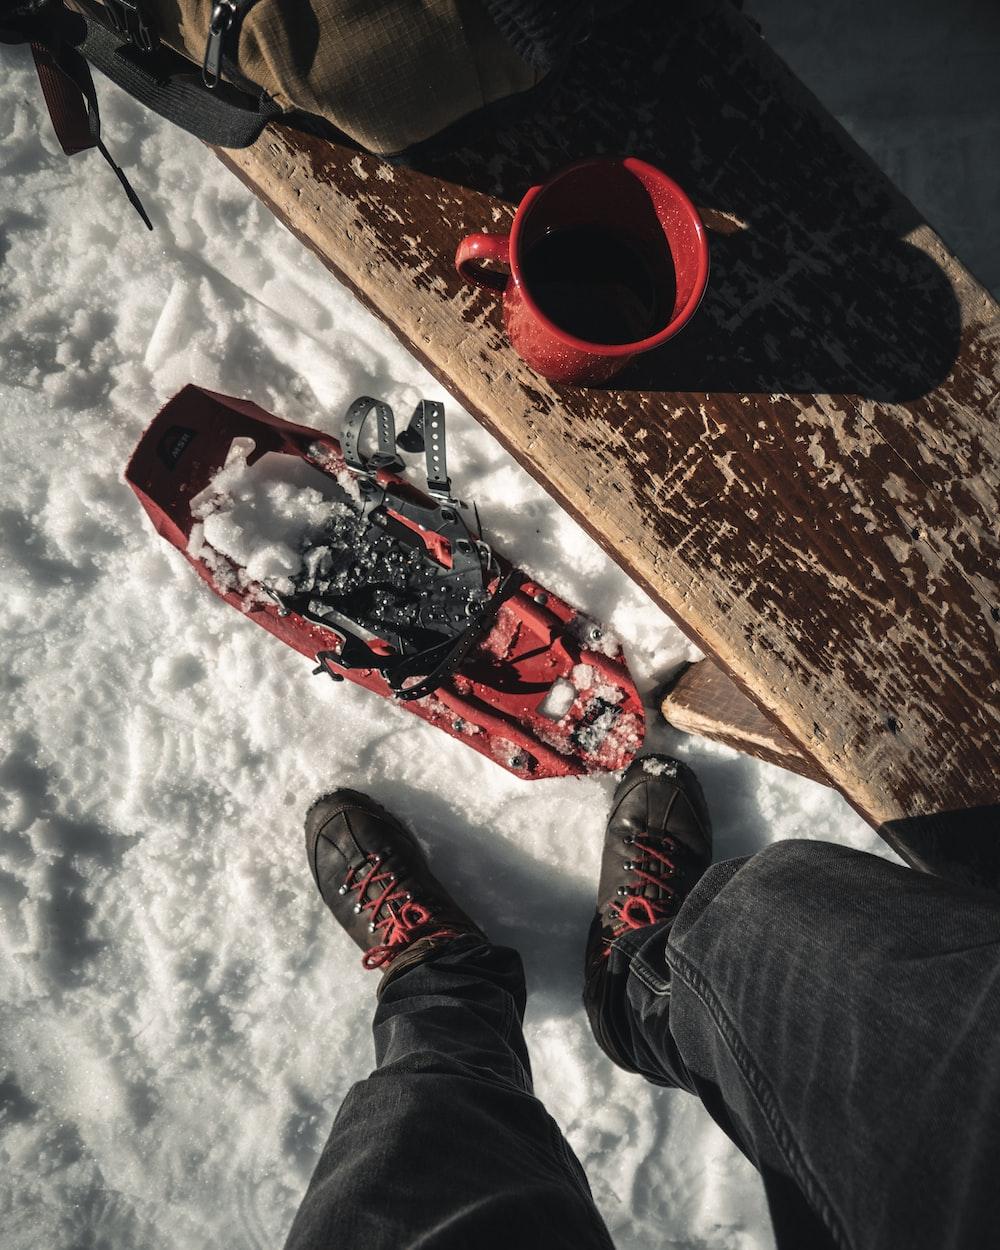 red ceramic mug on wooden bench outside snow